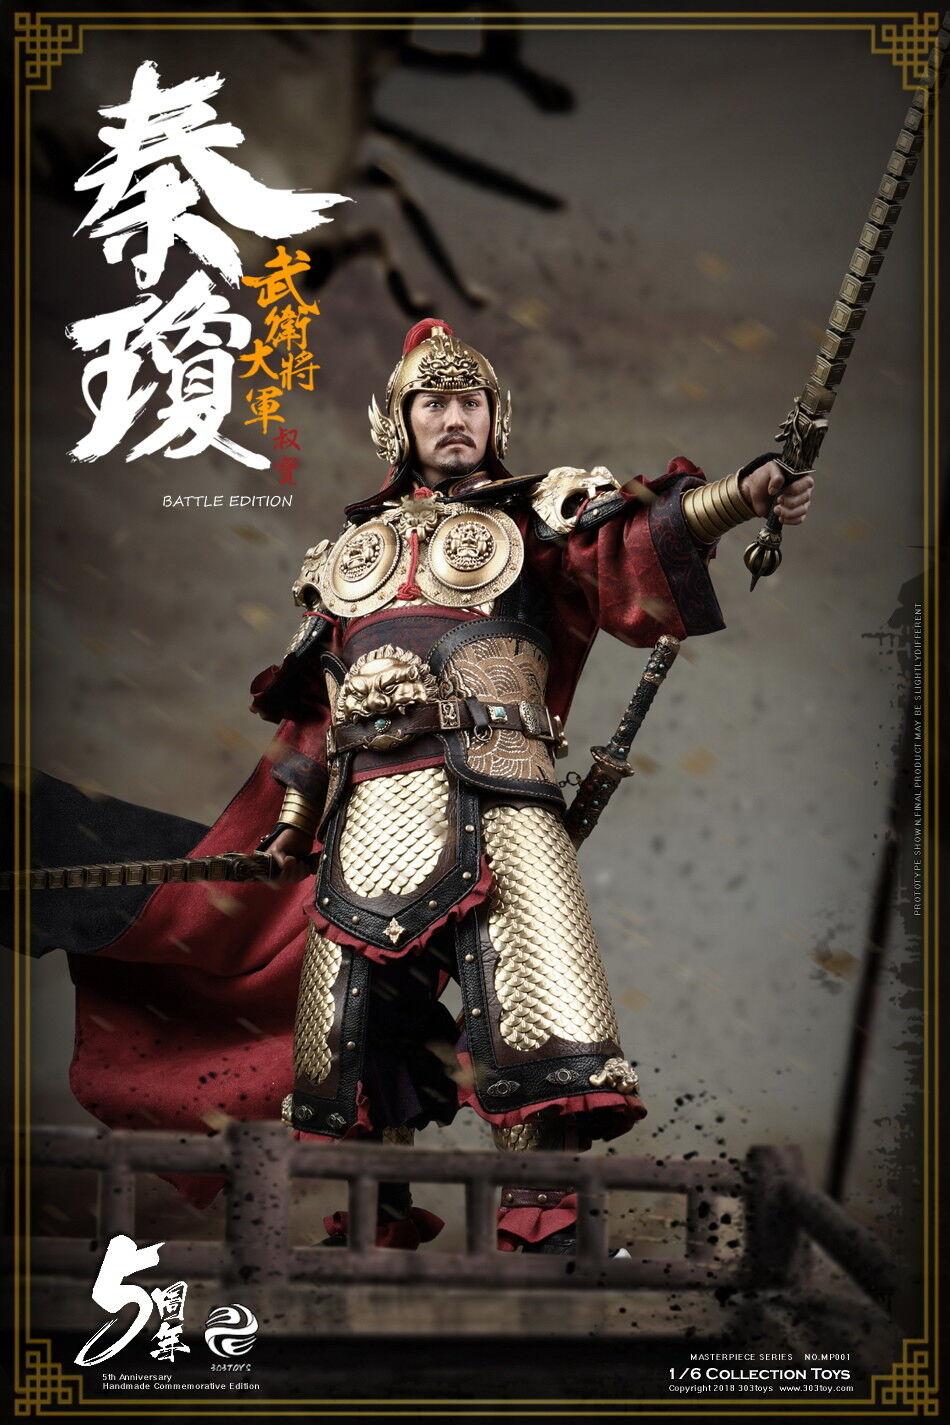 303TOYS GUARDING GENERAL - QIN QIONG A.K.A SHUBAO 1 6 FIGURE battle EDITION